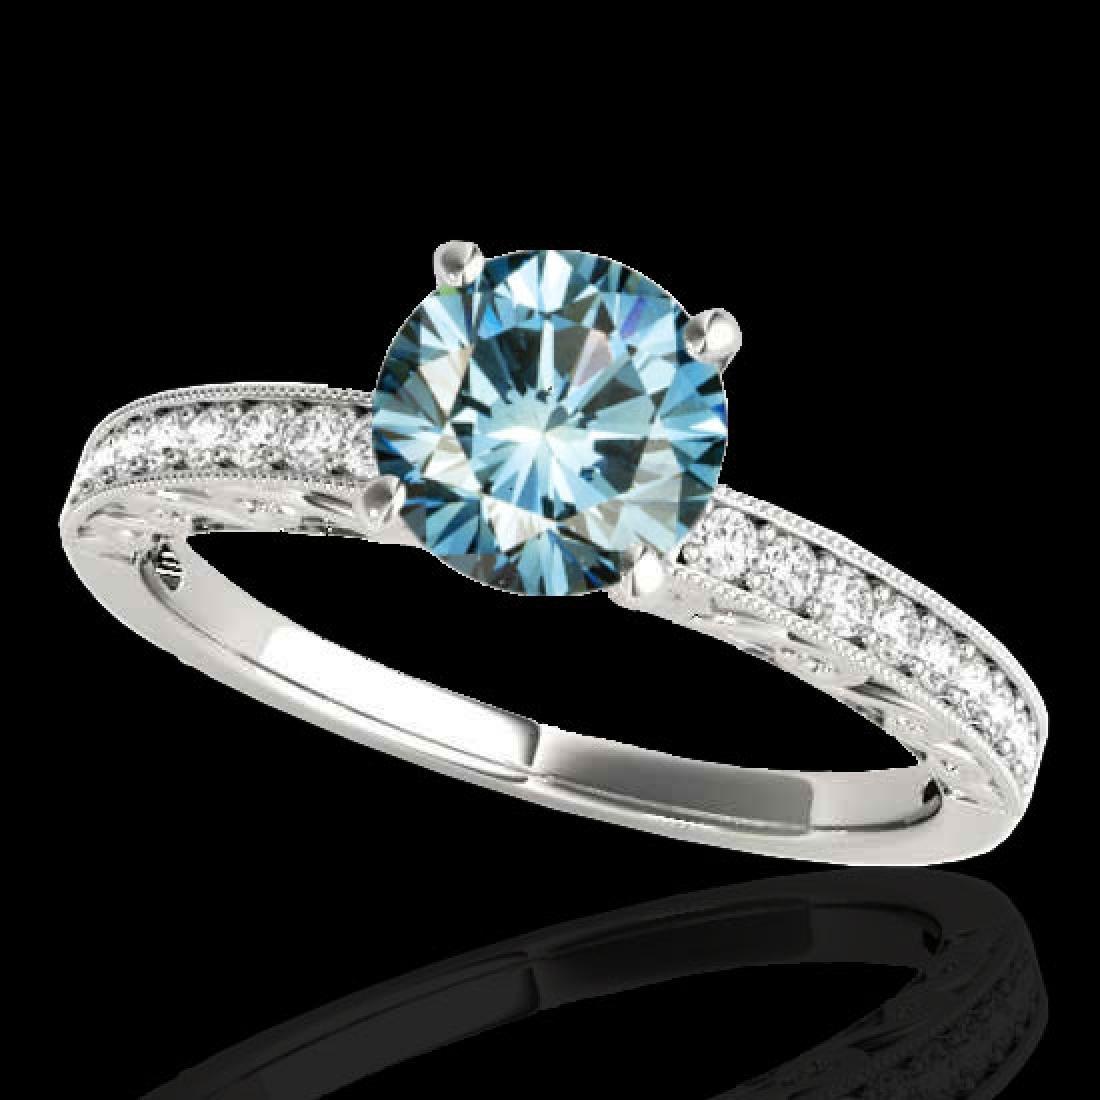 1.43 CTW SI Certified Blue Diamond Solitaire Antique